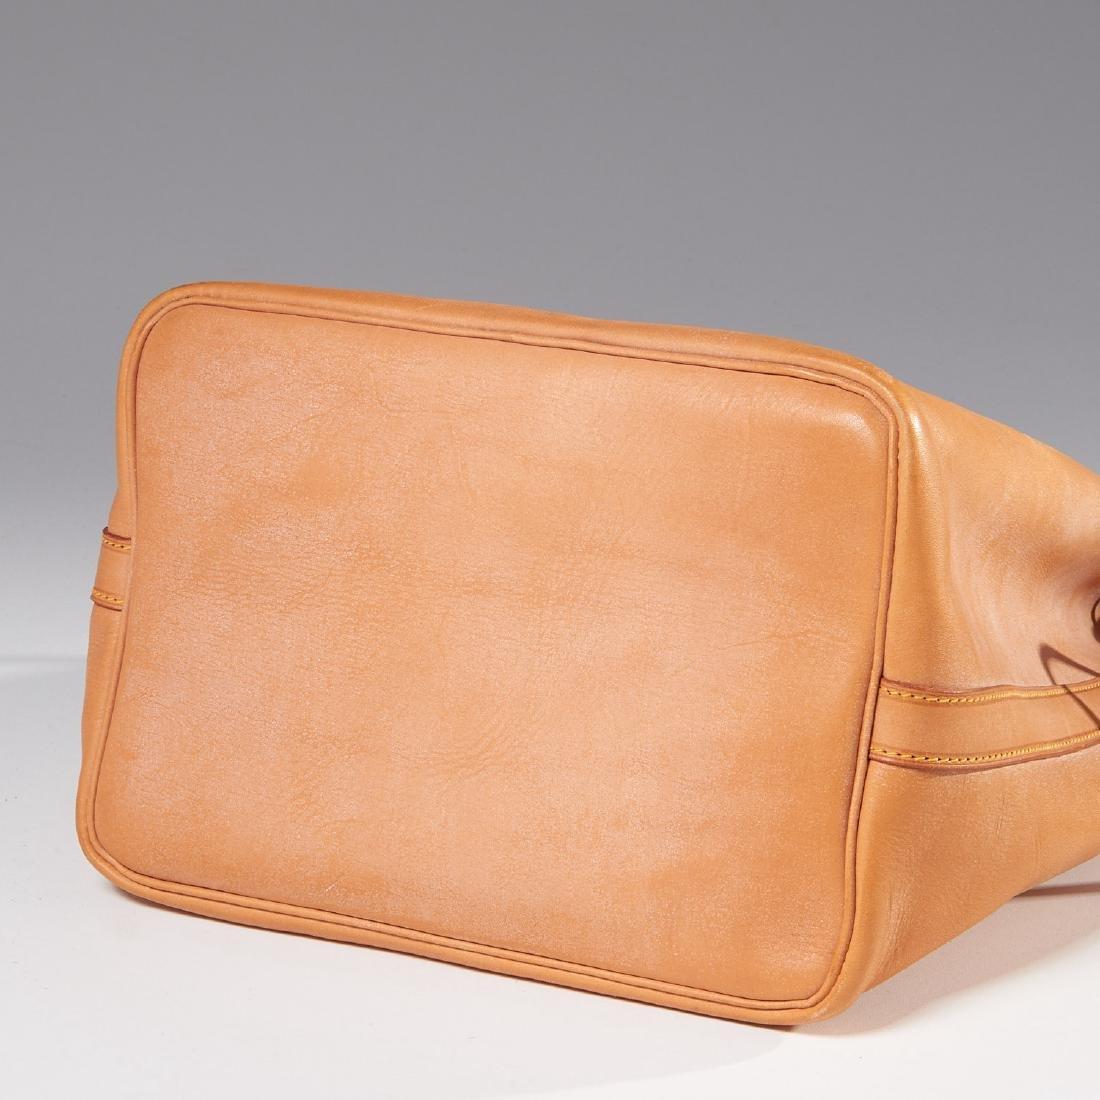 Louis Vuitton all leather drawstring handbag - 8